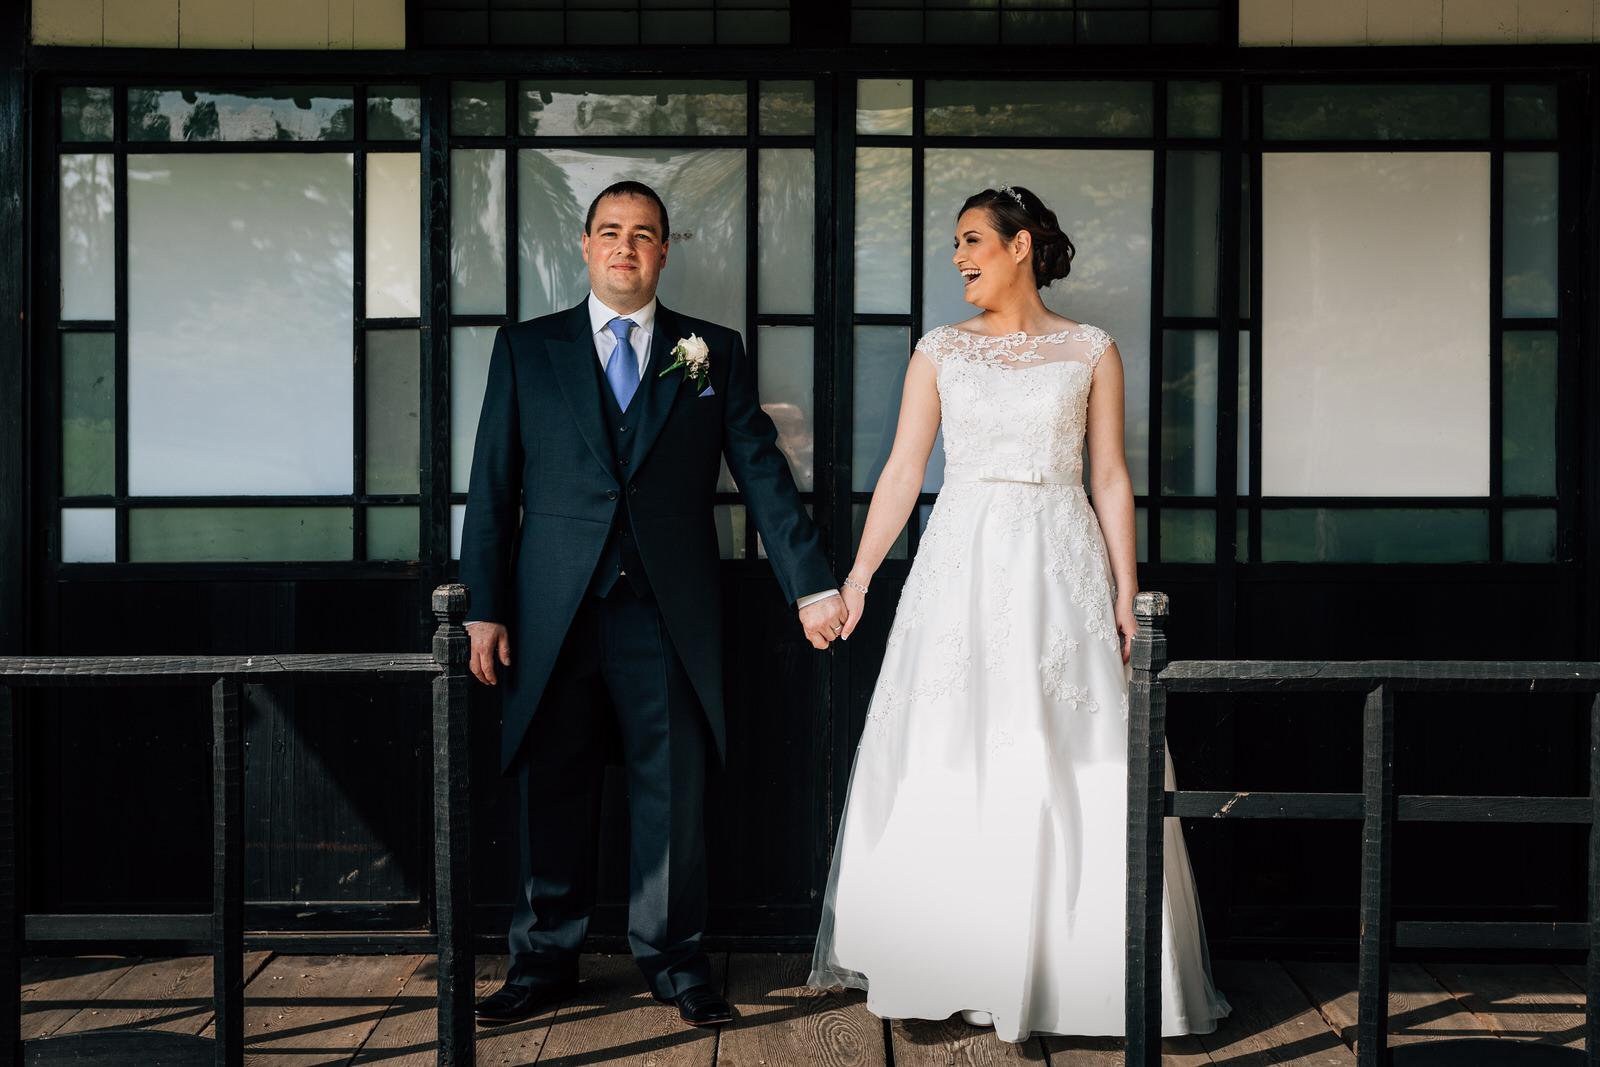 Home counties wedding photography by Damion Mower on English-Wedding.com (39)